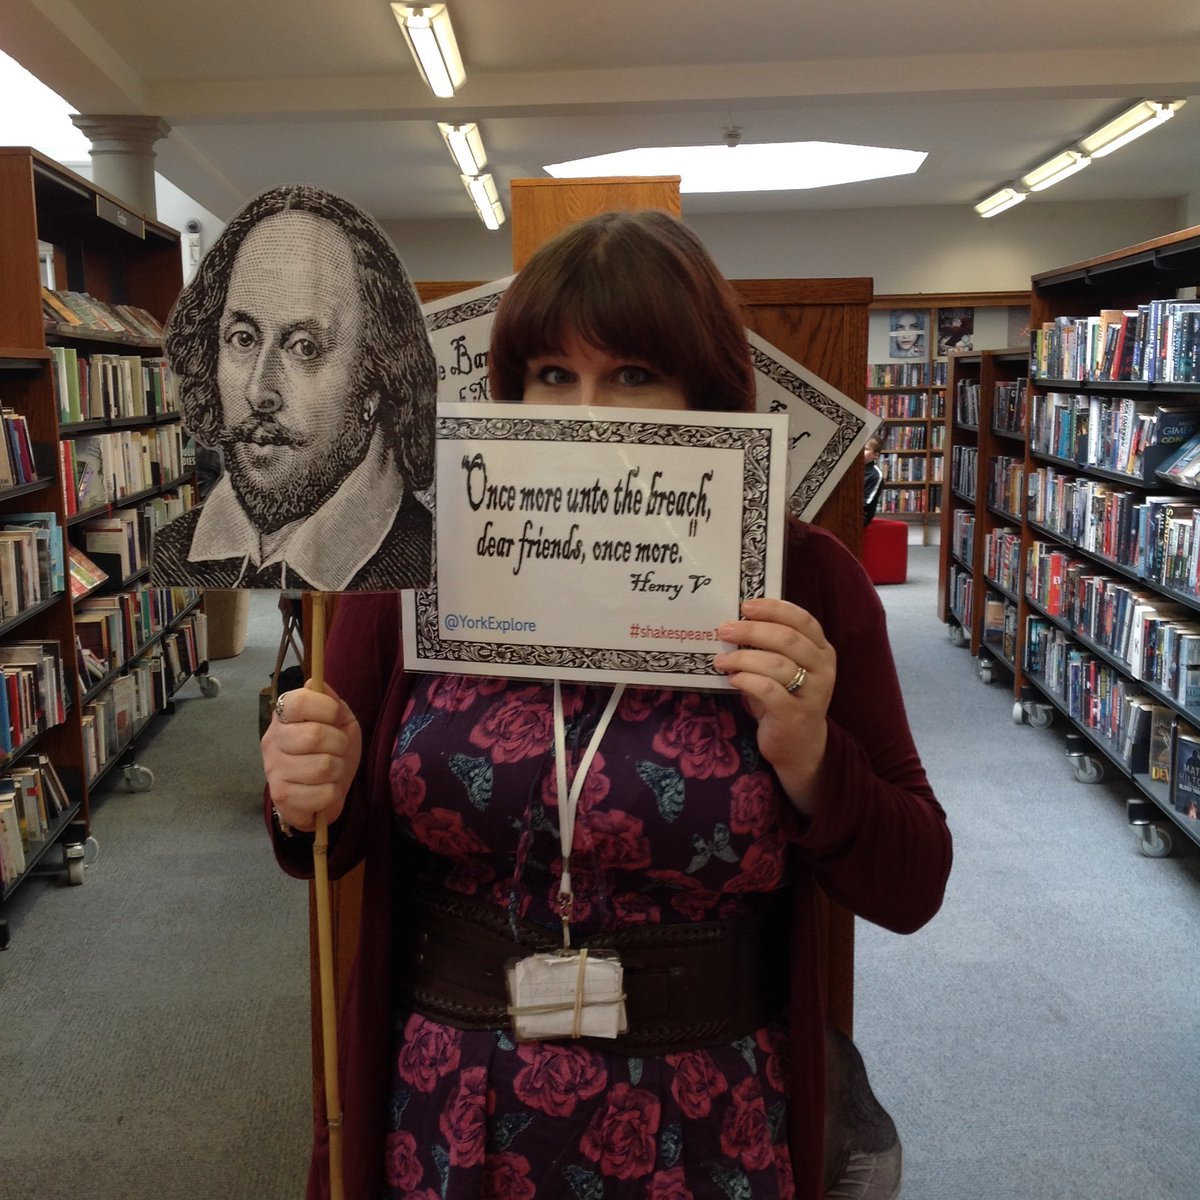 #Shakespeare16 #Shakespeare400 #WBN16 #selfie https://t.co/EUVxIuEAh9